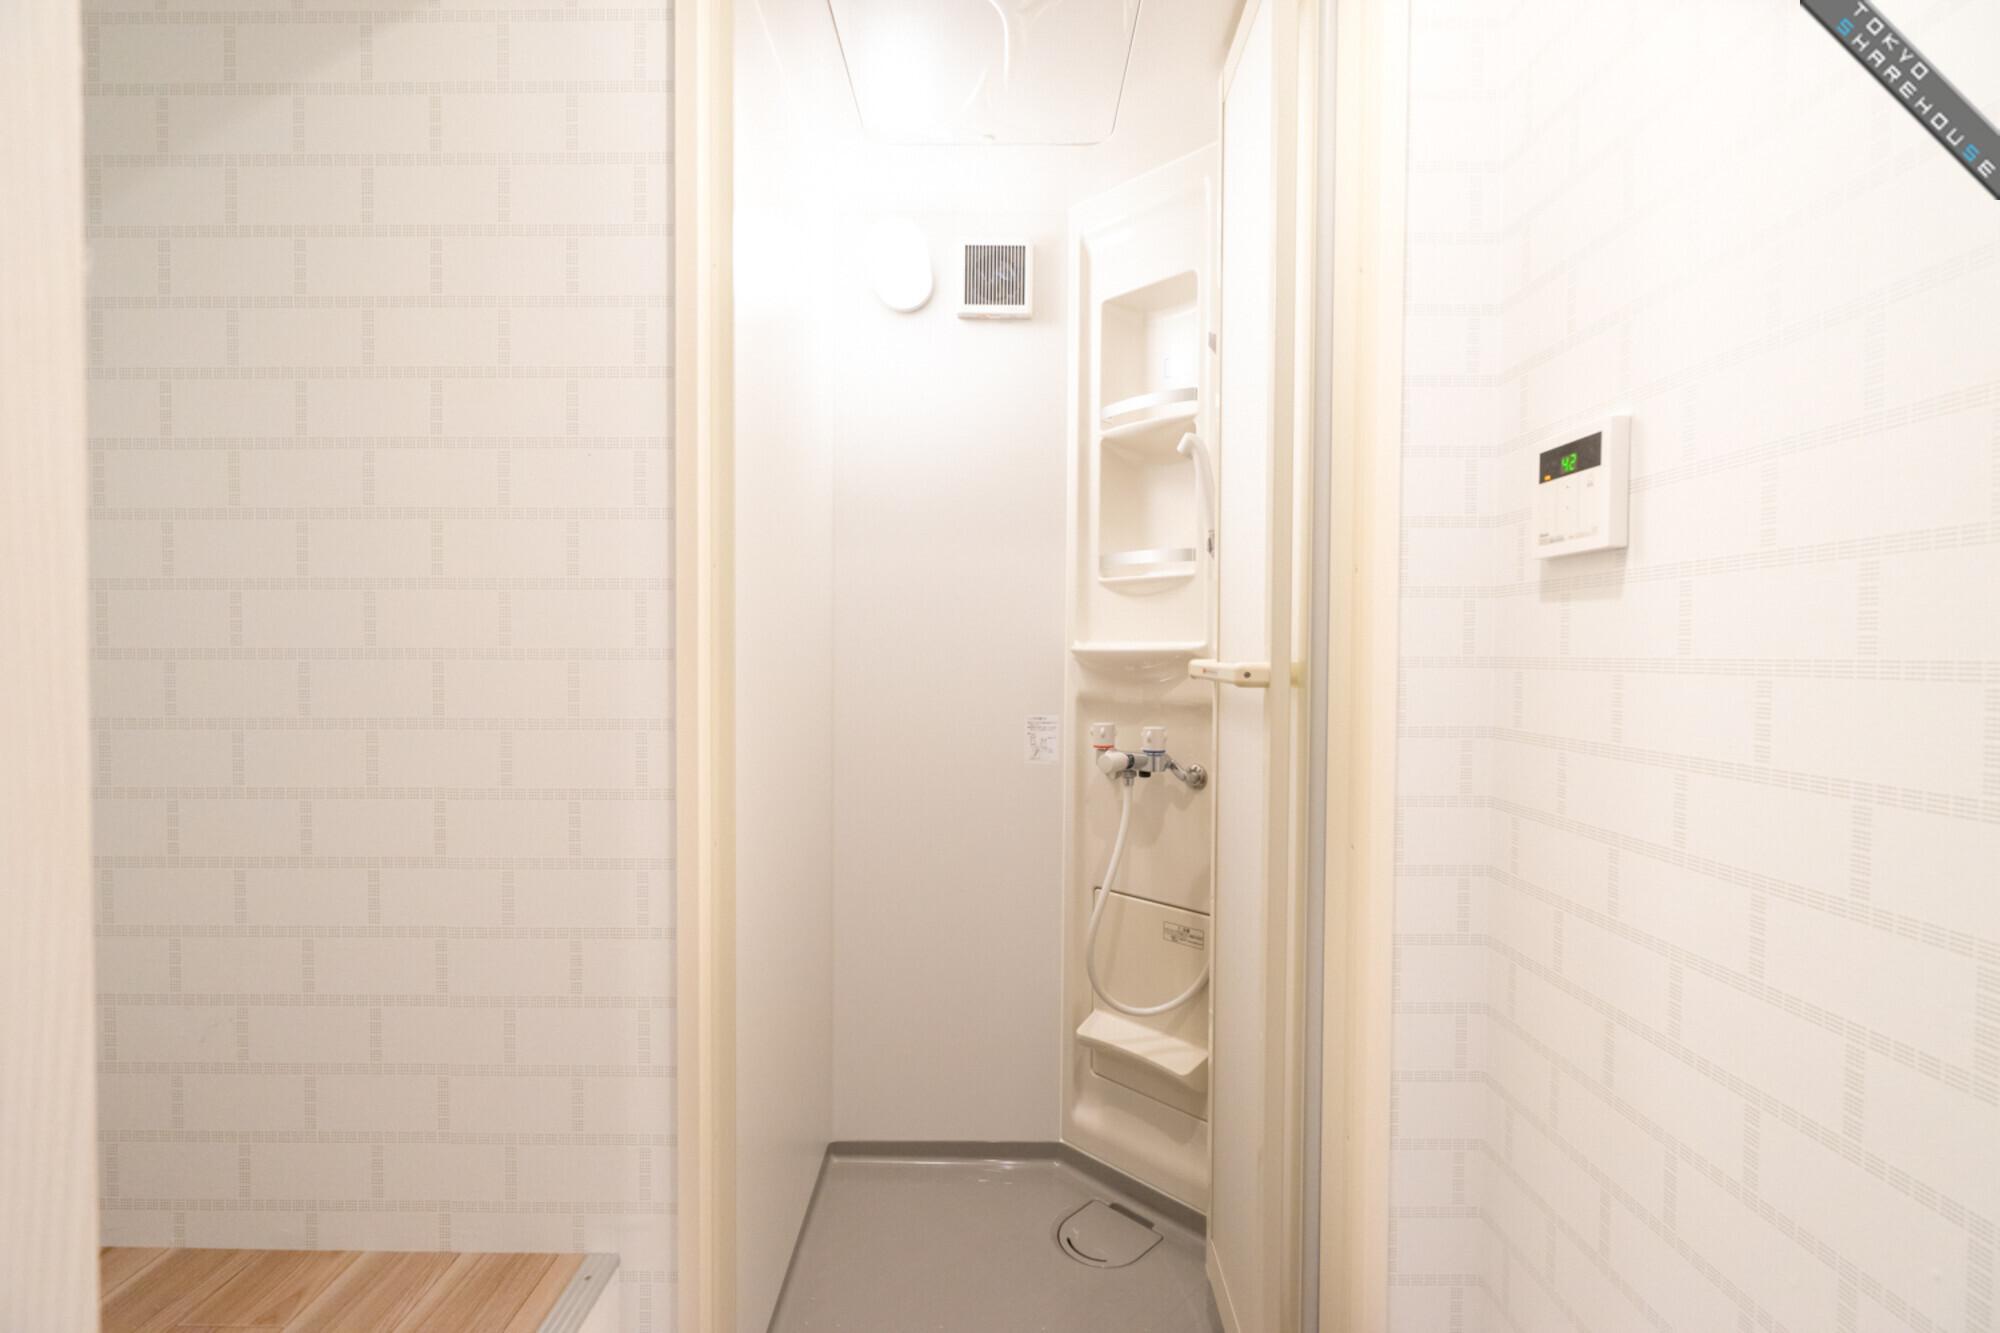 2F_シャワー室_01